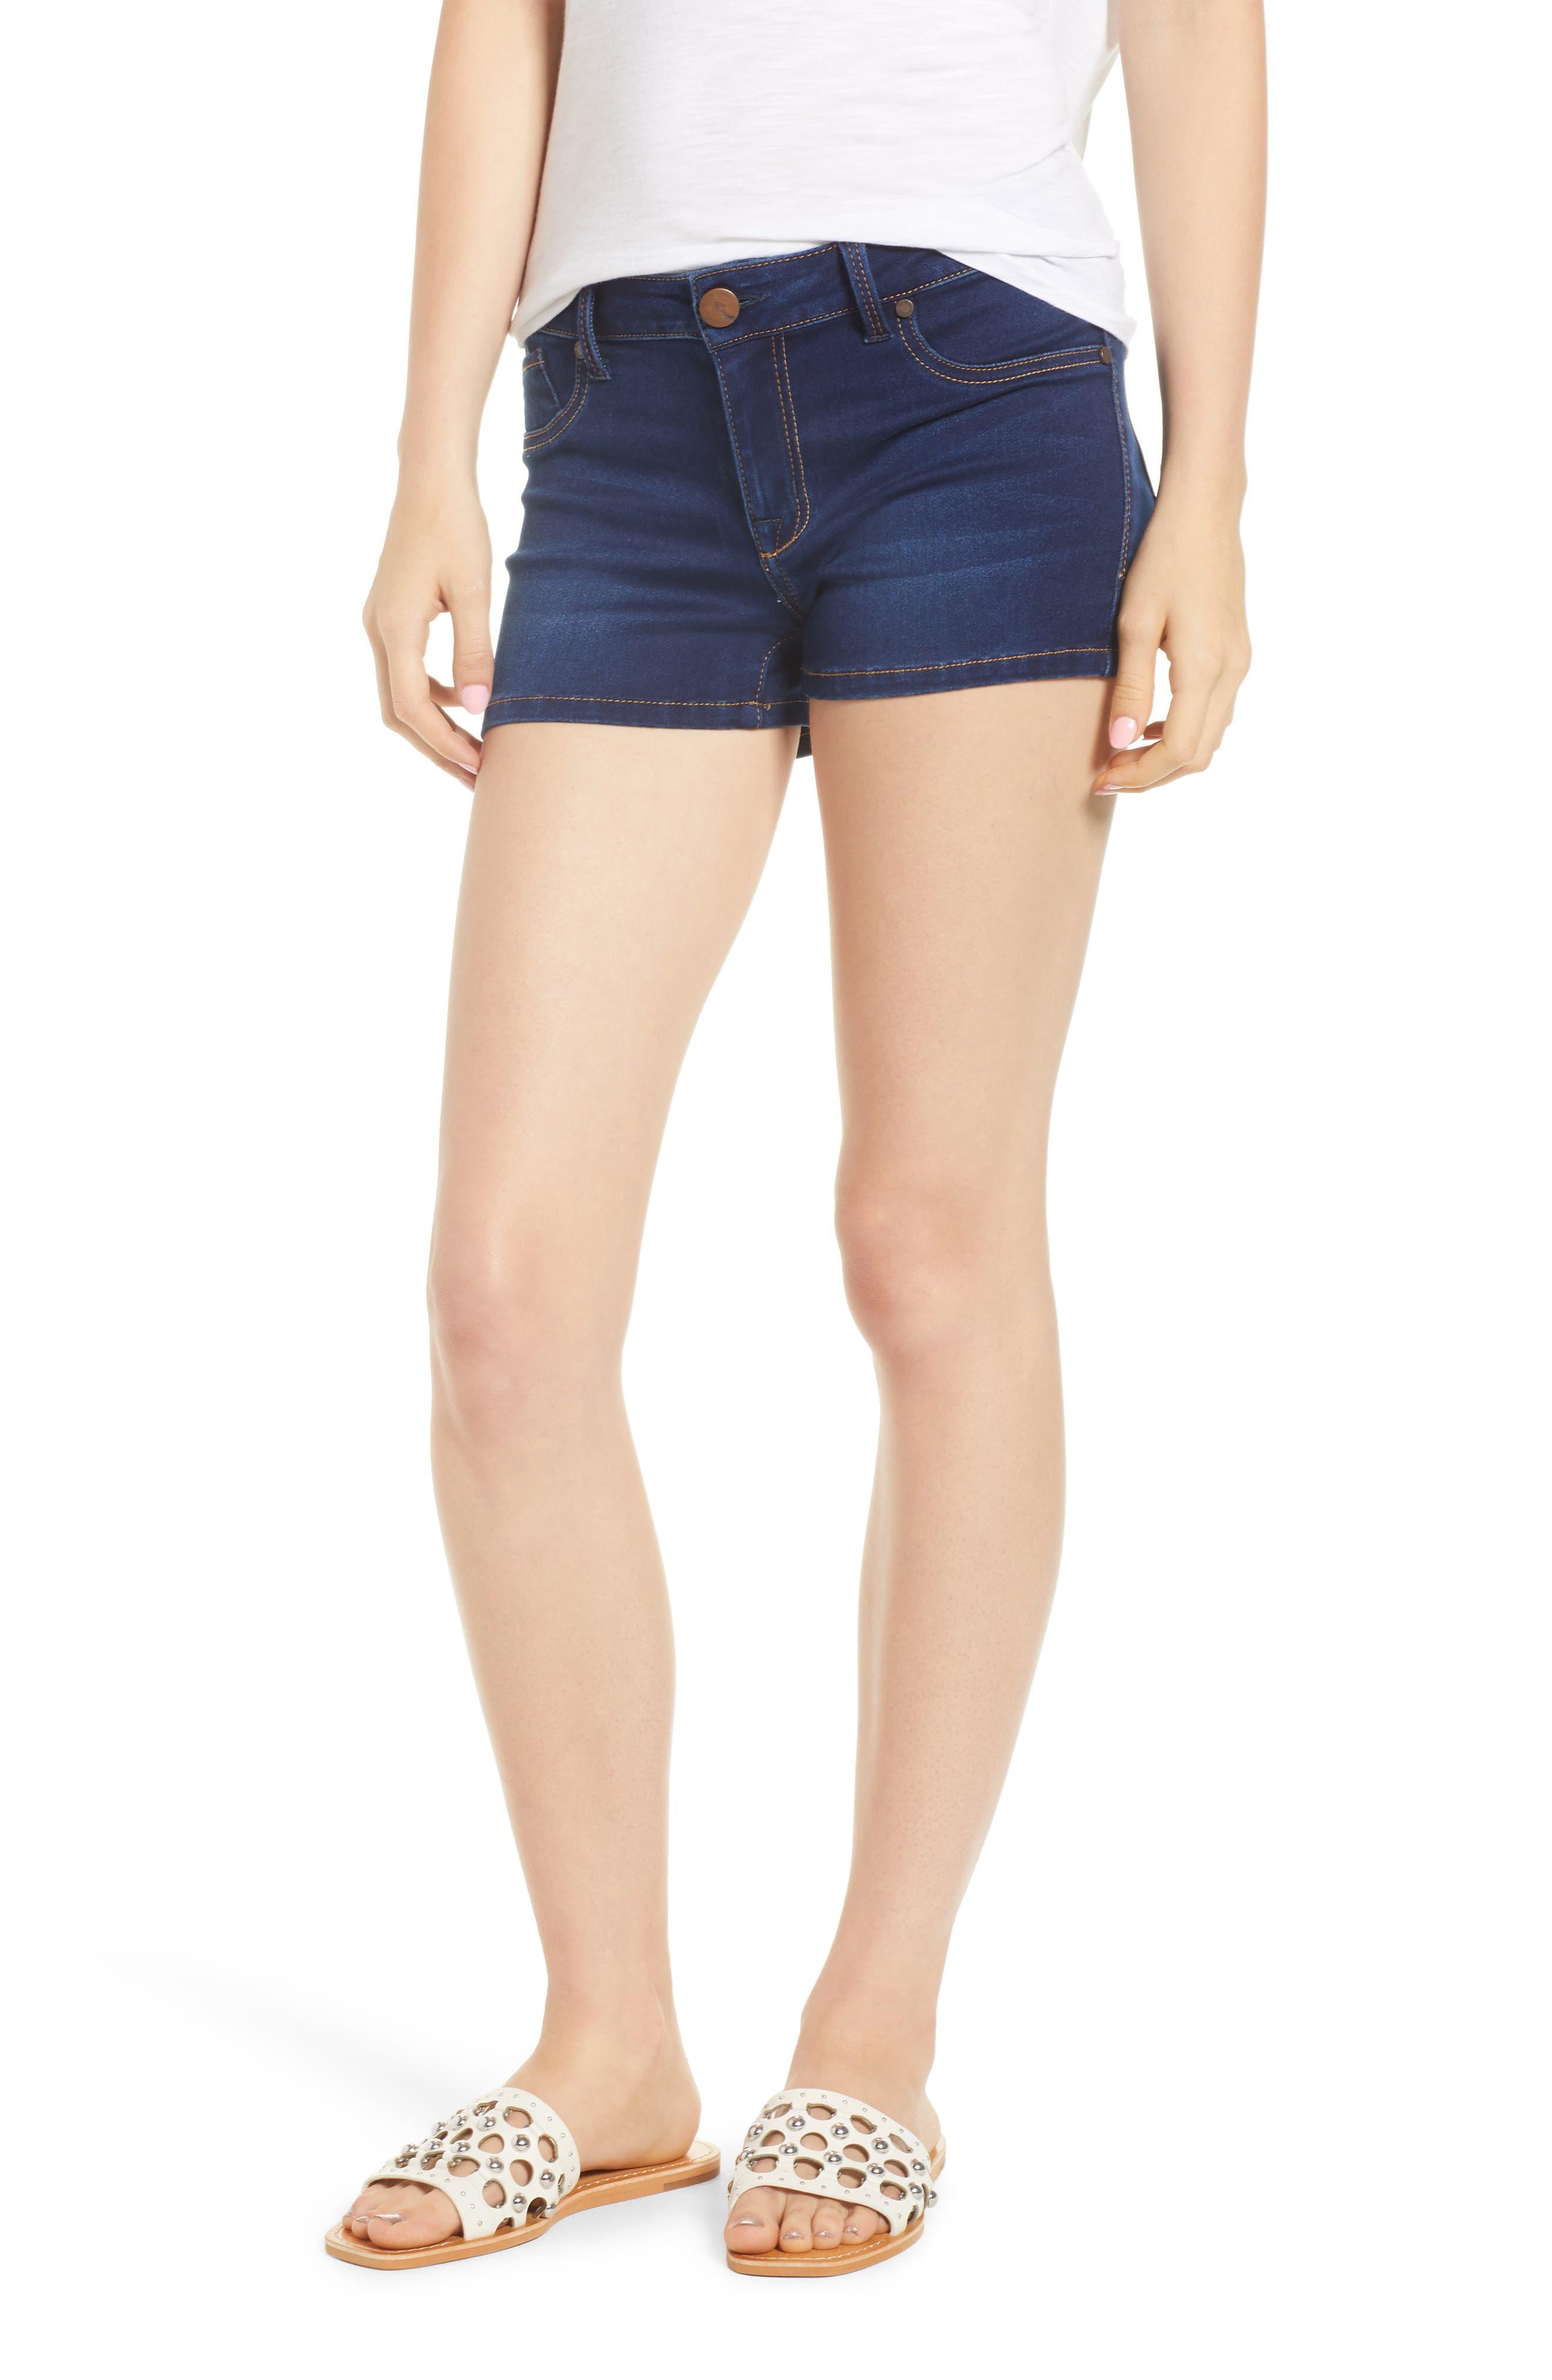 Butter Denim Shorts,                             Main thumbnail 1, color,                             LENNOX